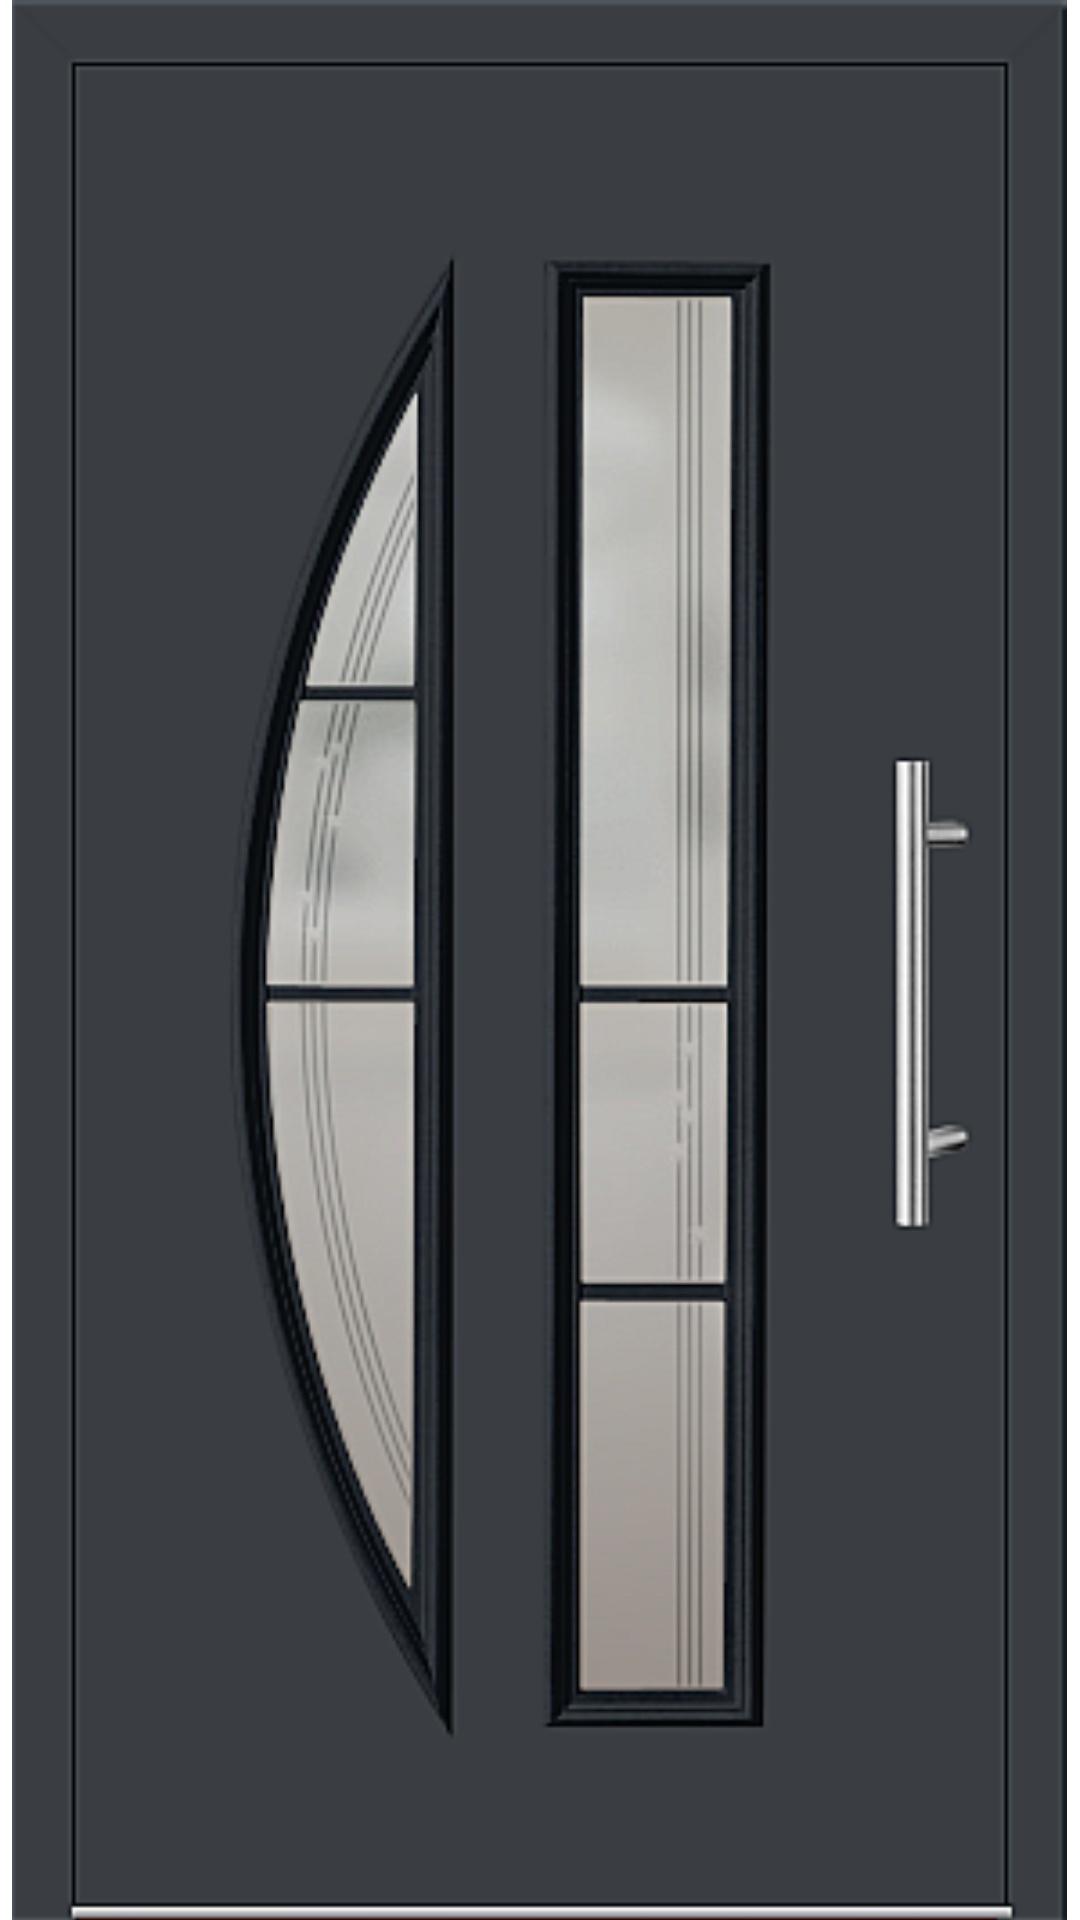 Kunststoff Haustür Modell 6525-65 anthrazitgrau